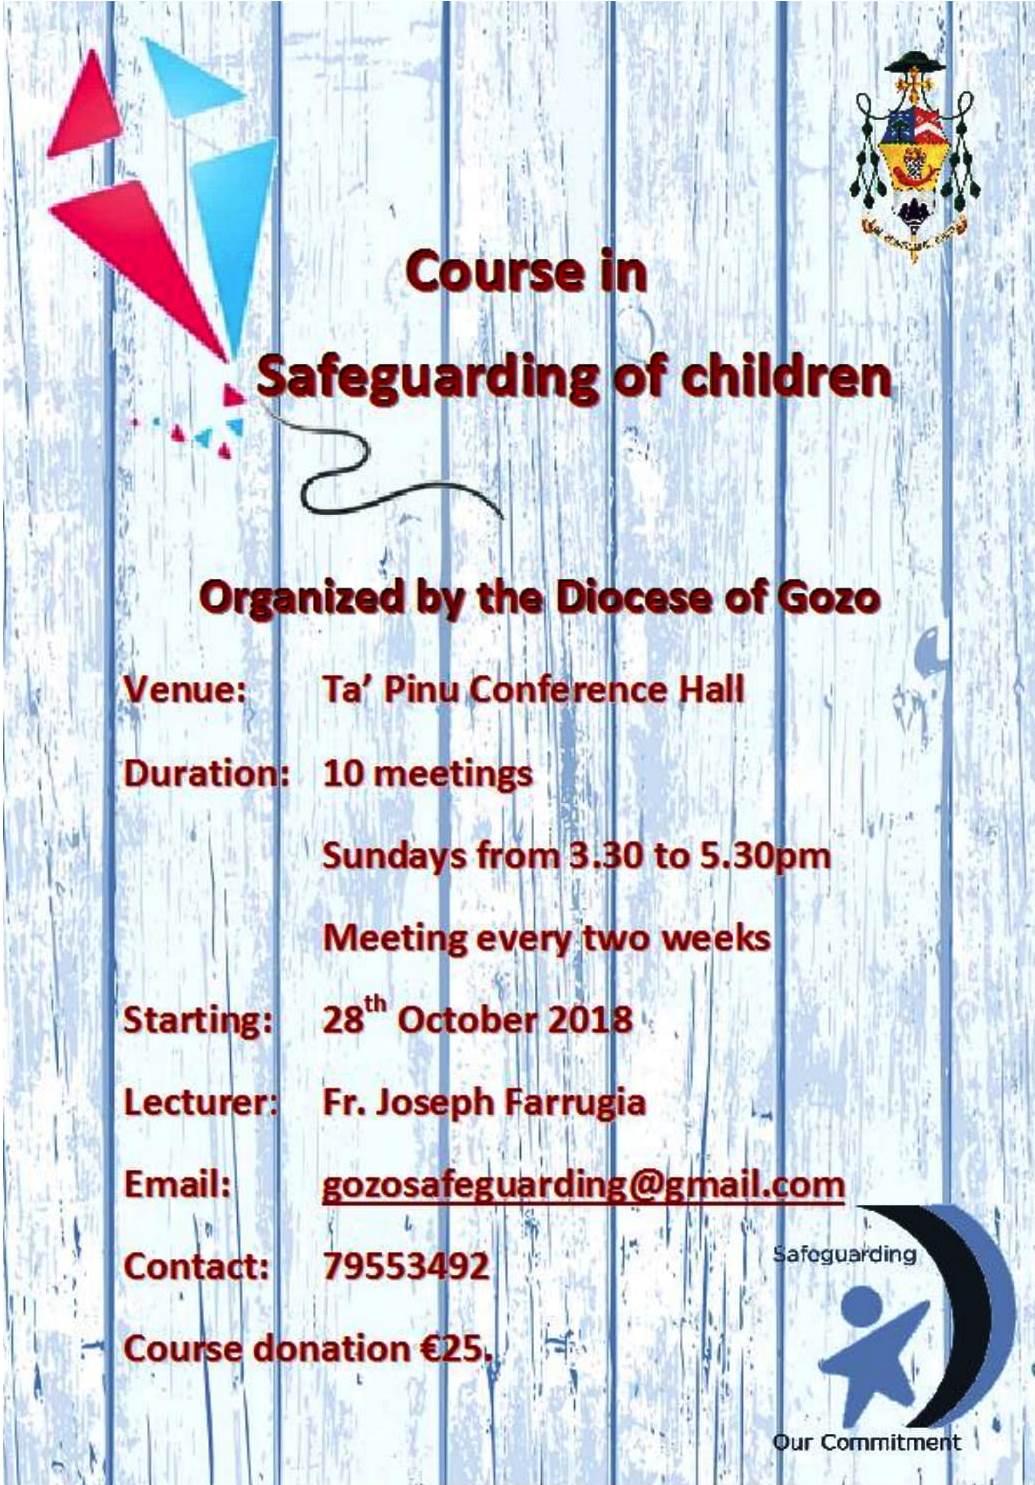 course-in-safeguarding-of-children-2018-2019-1.jpg